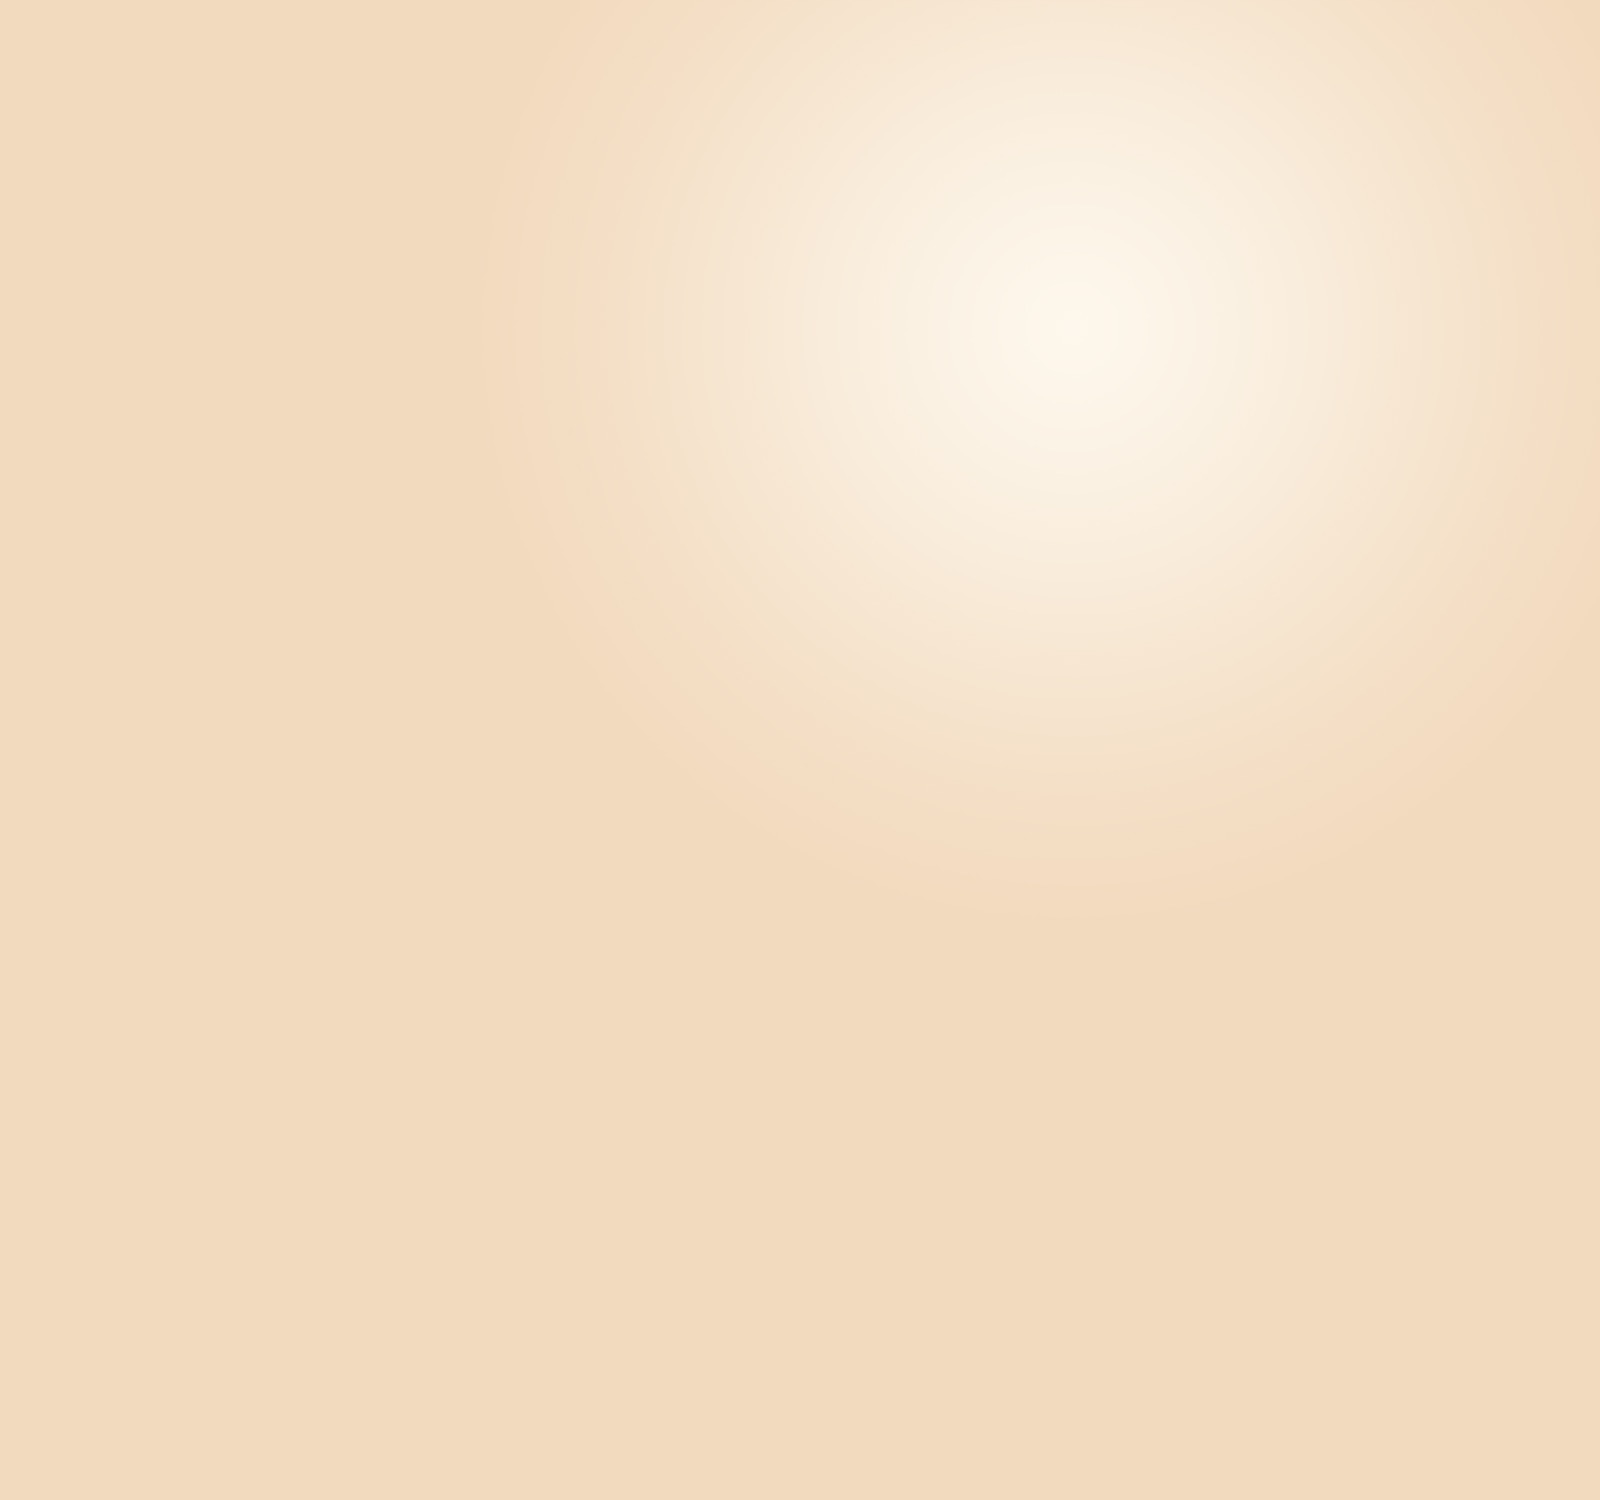 TENA-Lights-sample-page-bkgd-1600x1500.jpg